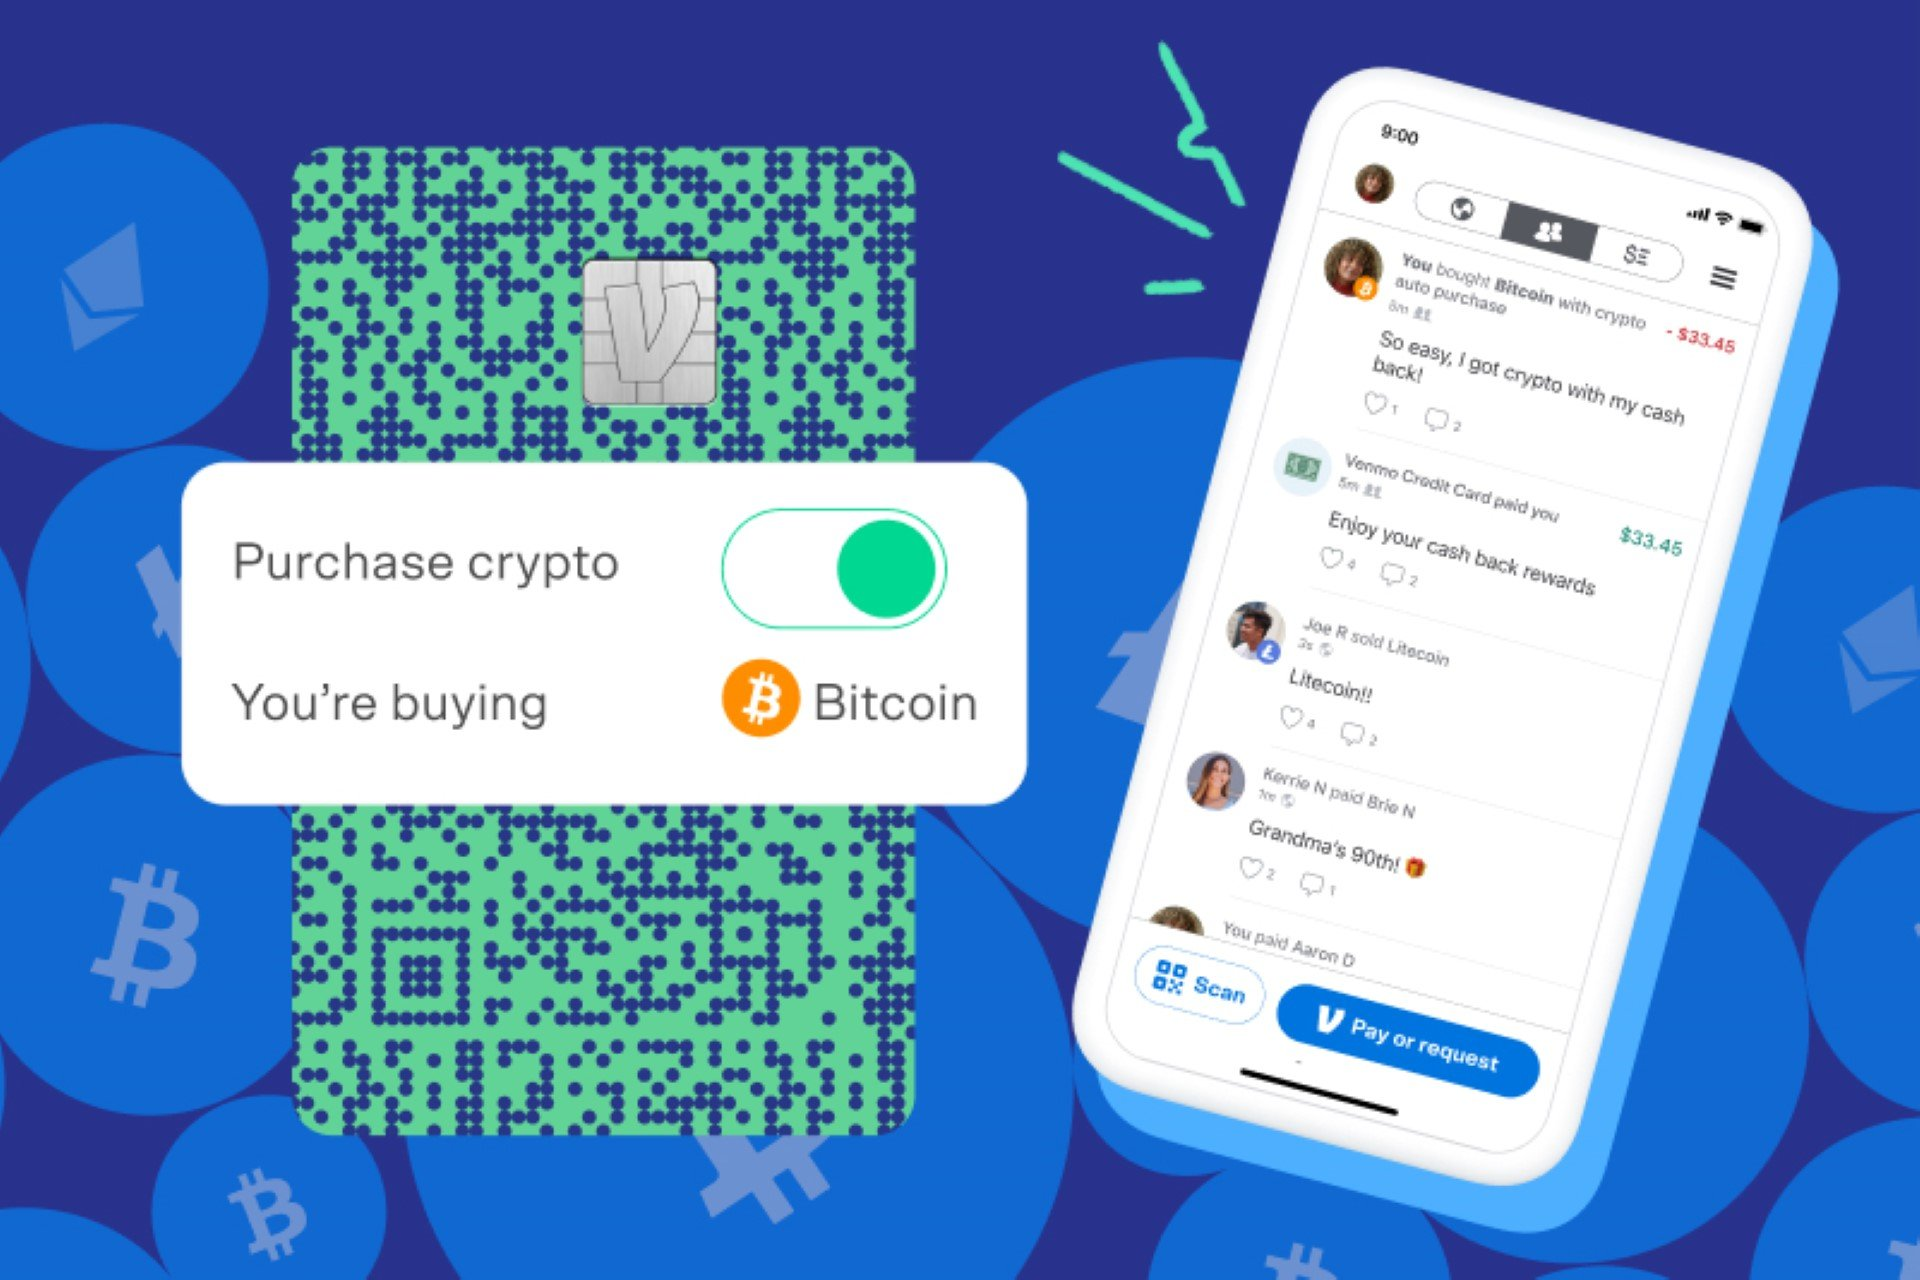 venmo visa cryptocurrency bitcoin